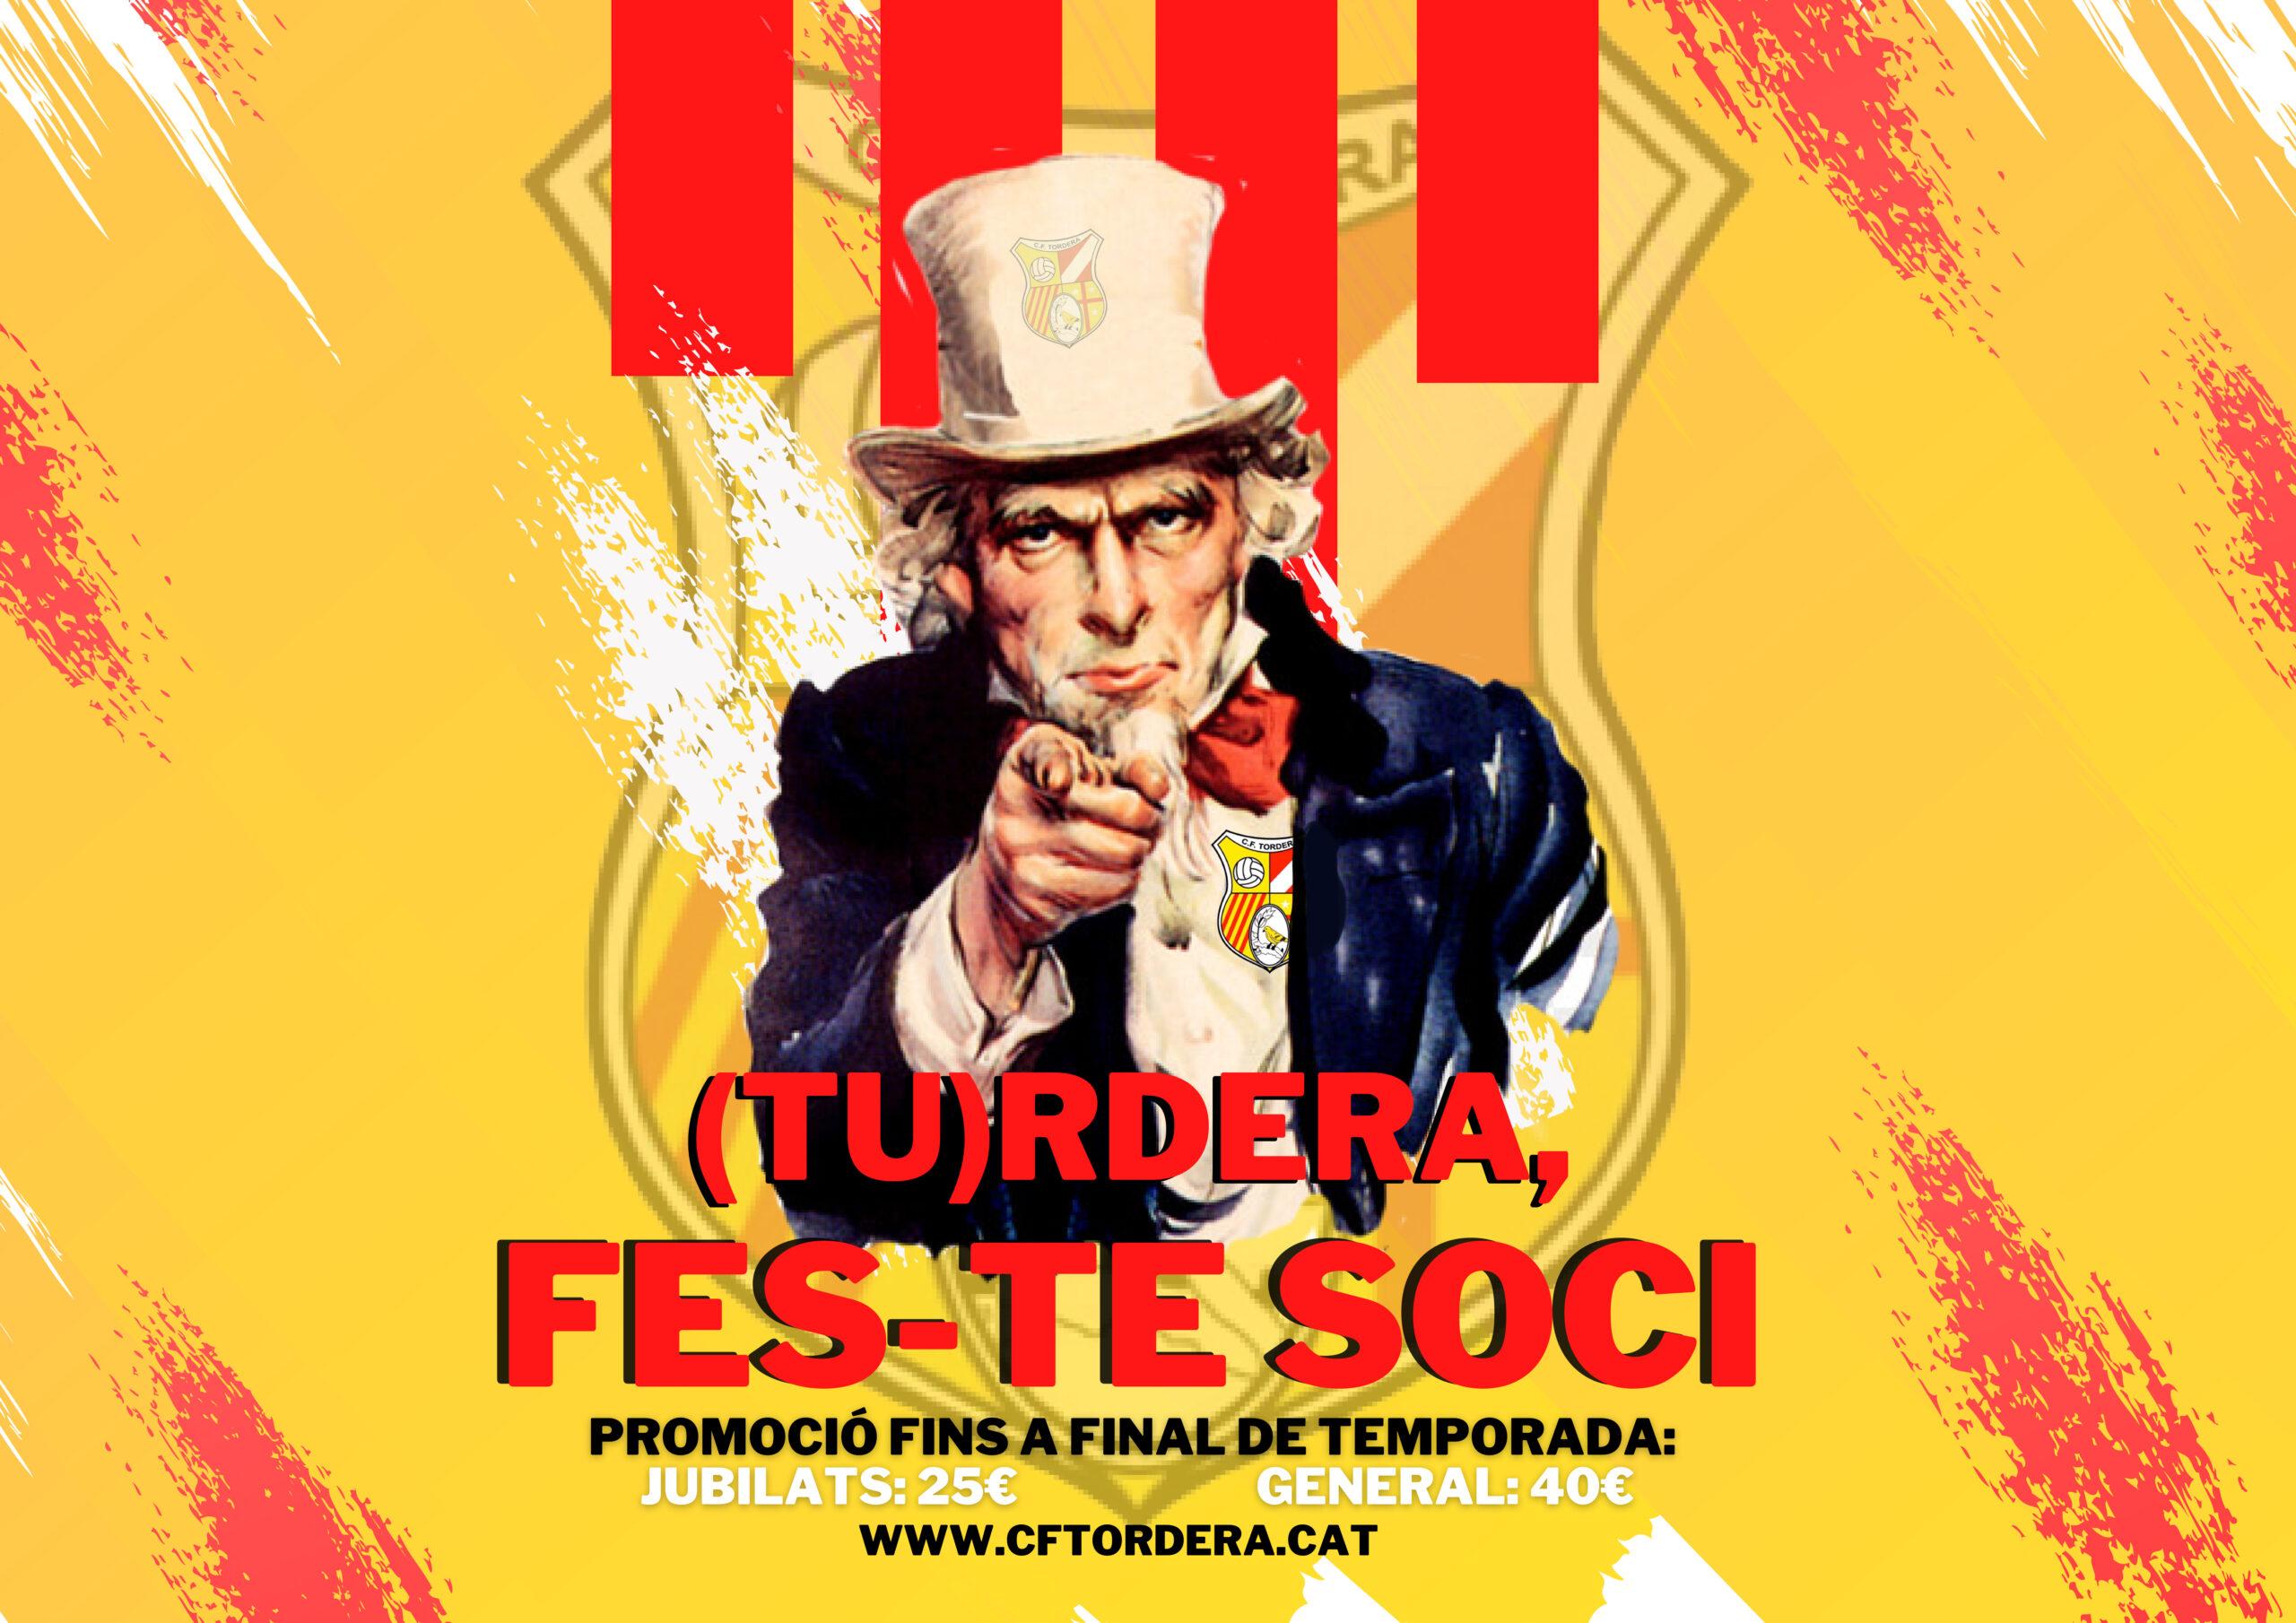 (TU)RDERA: FES-TE SOCI!